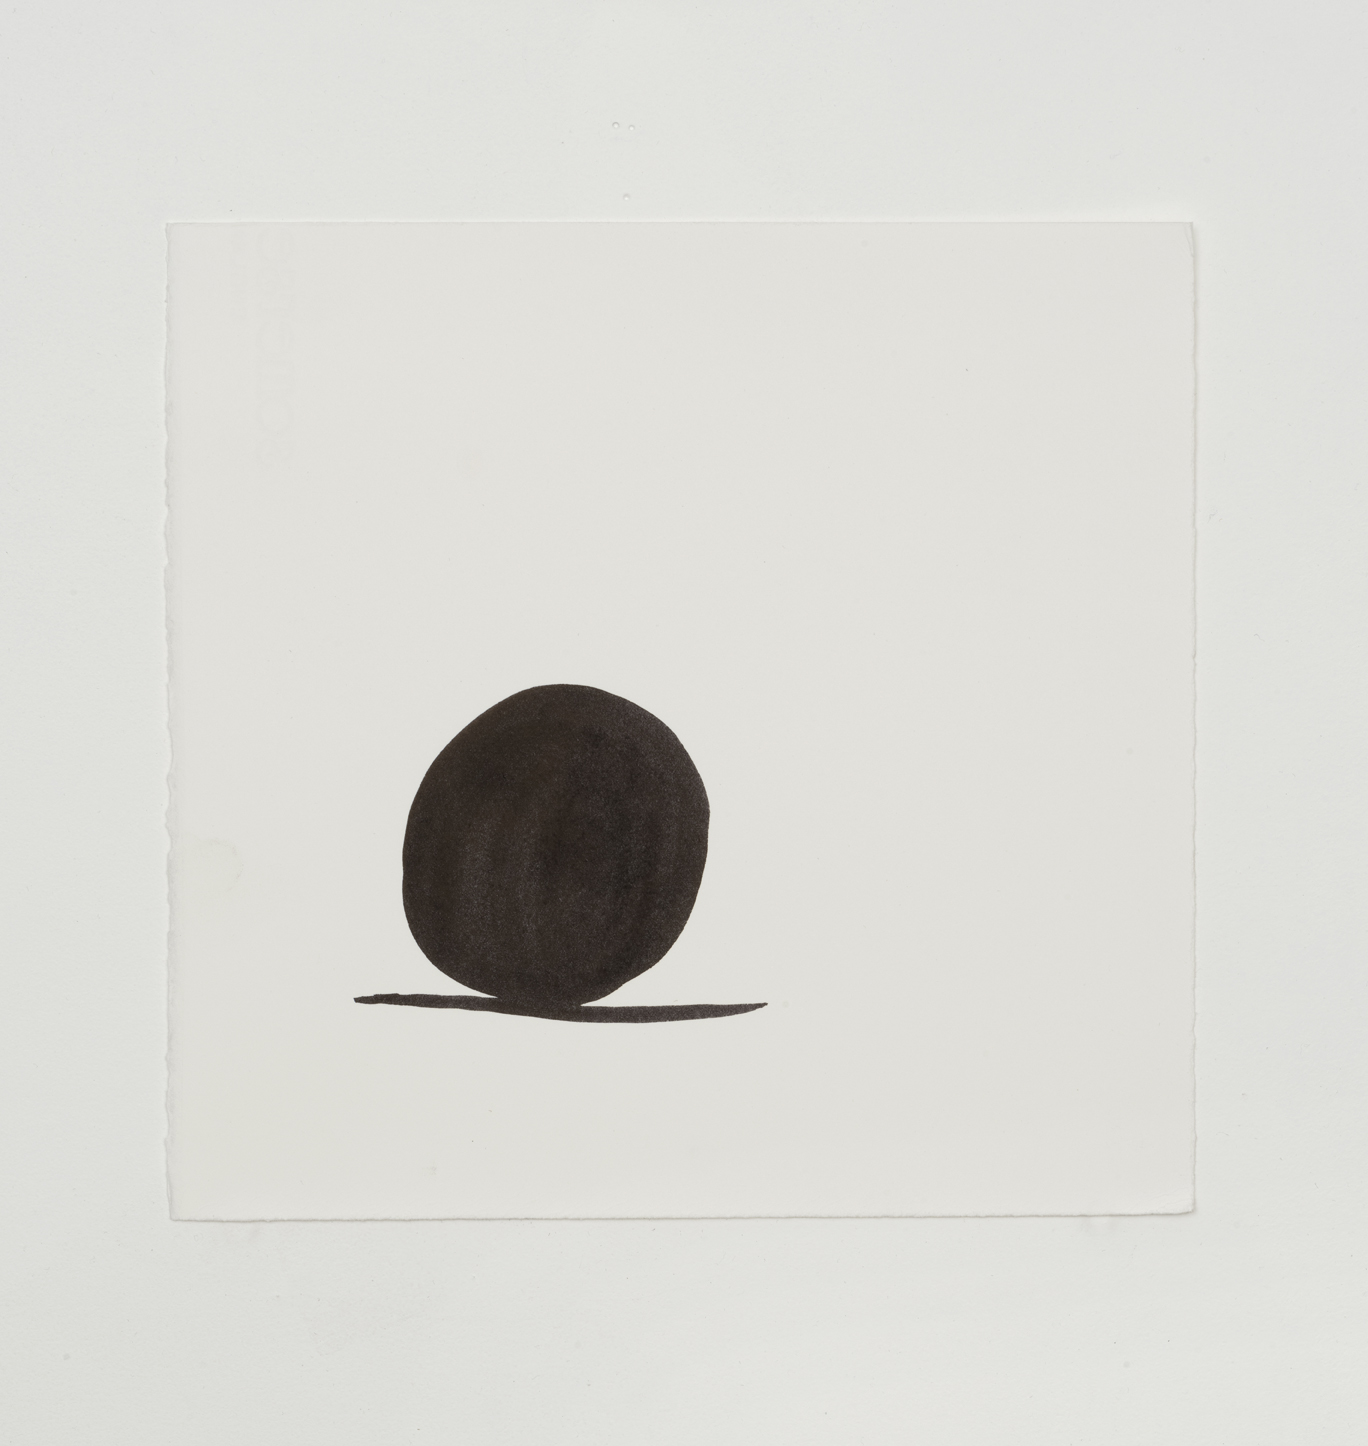 Untitled, Berlin Box 33